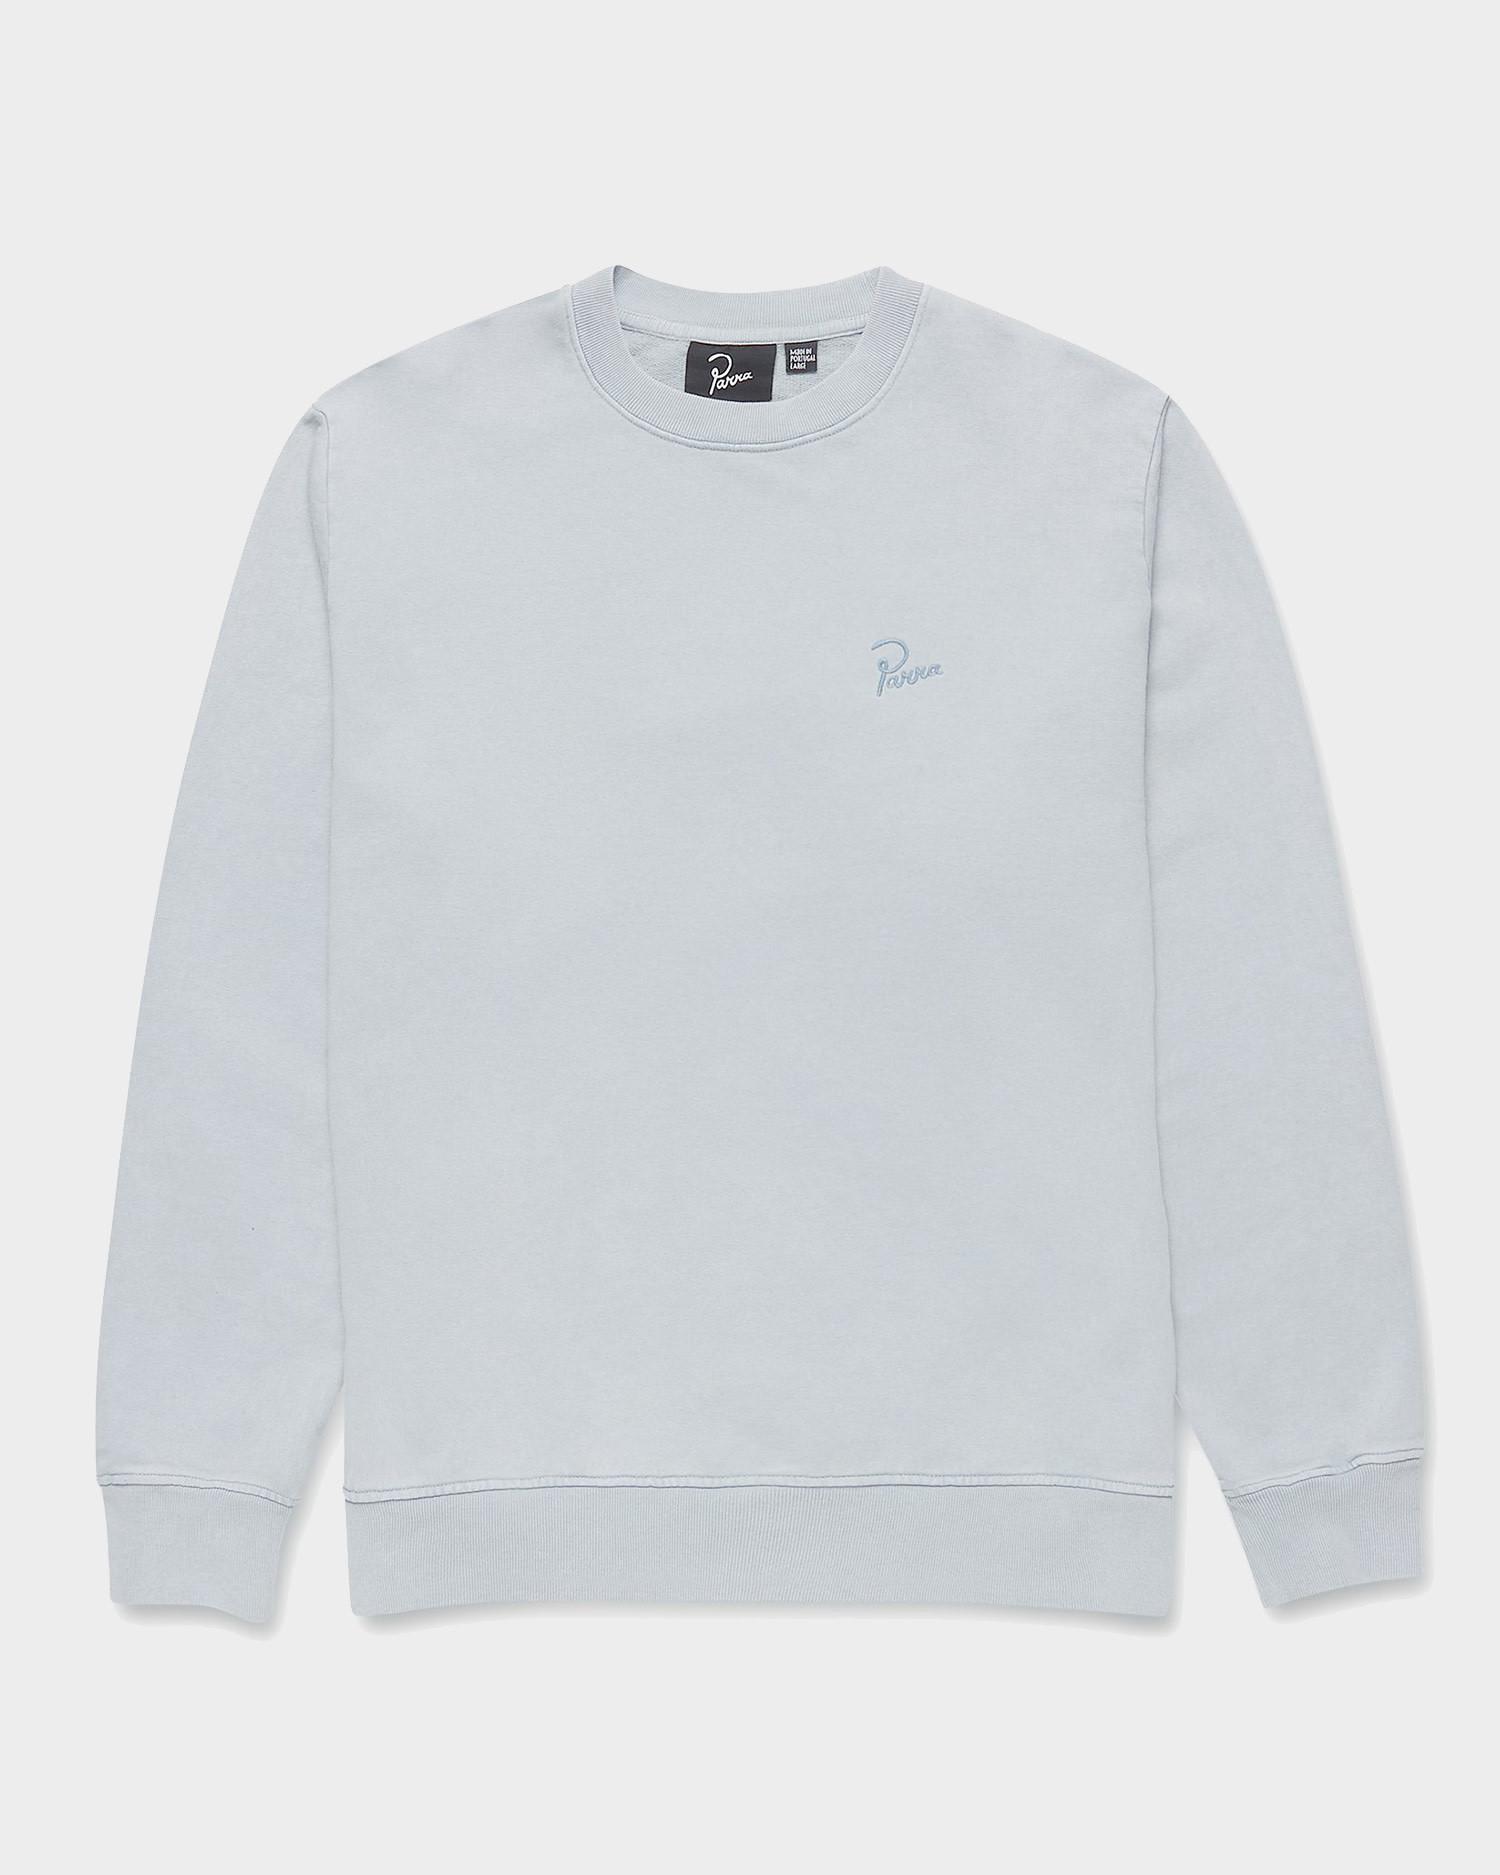 Parra signature logo Crewneck sweatshirt Dusty Blue